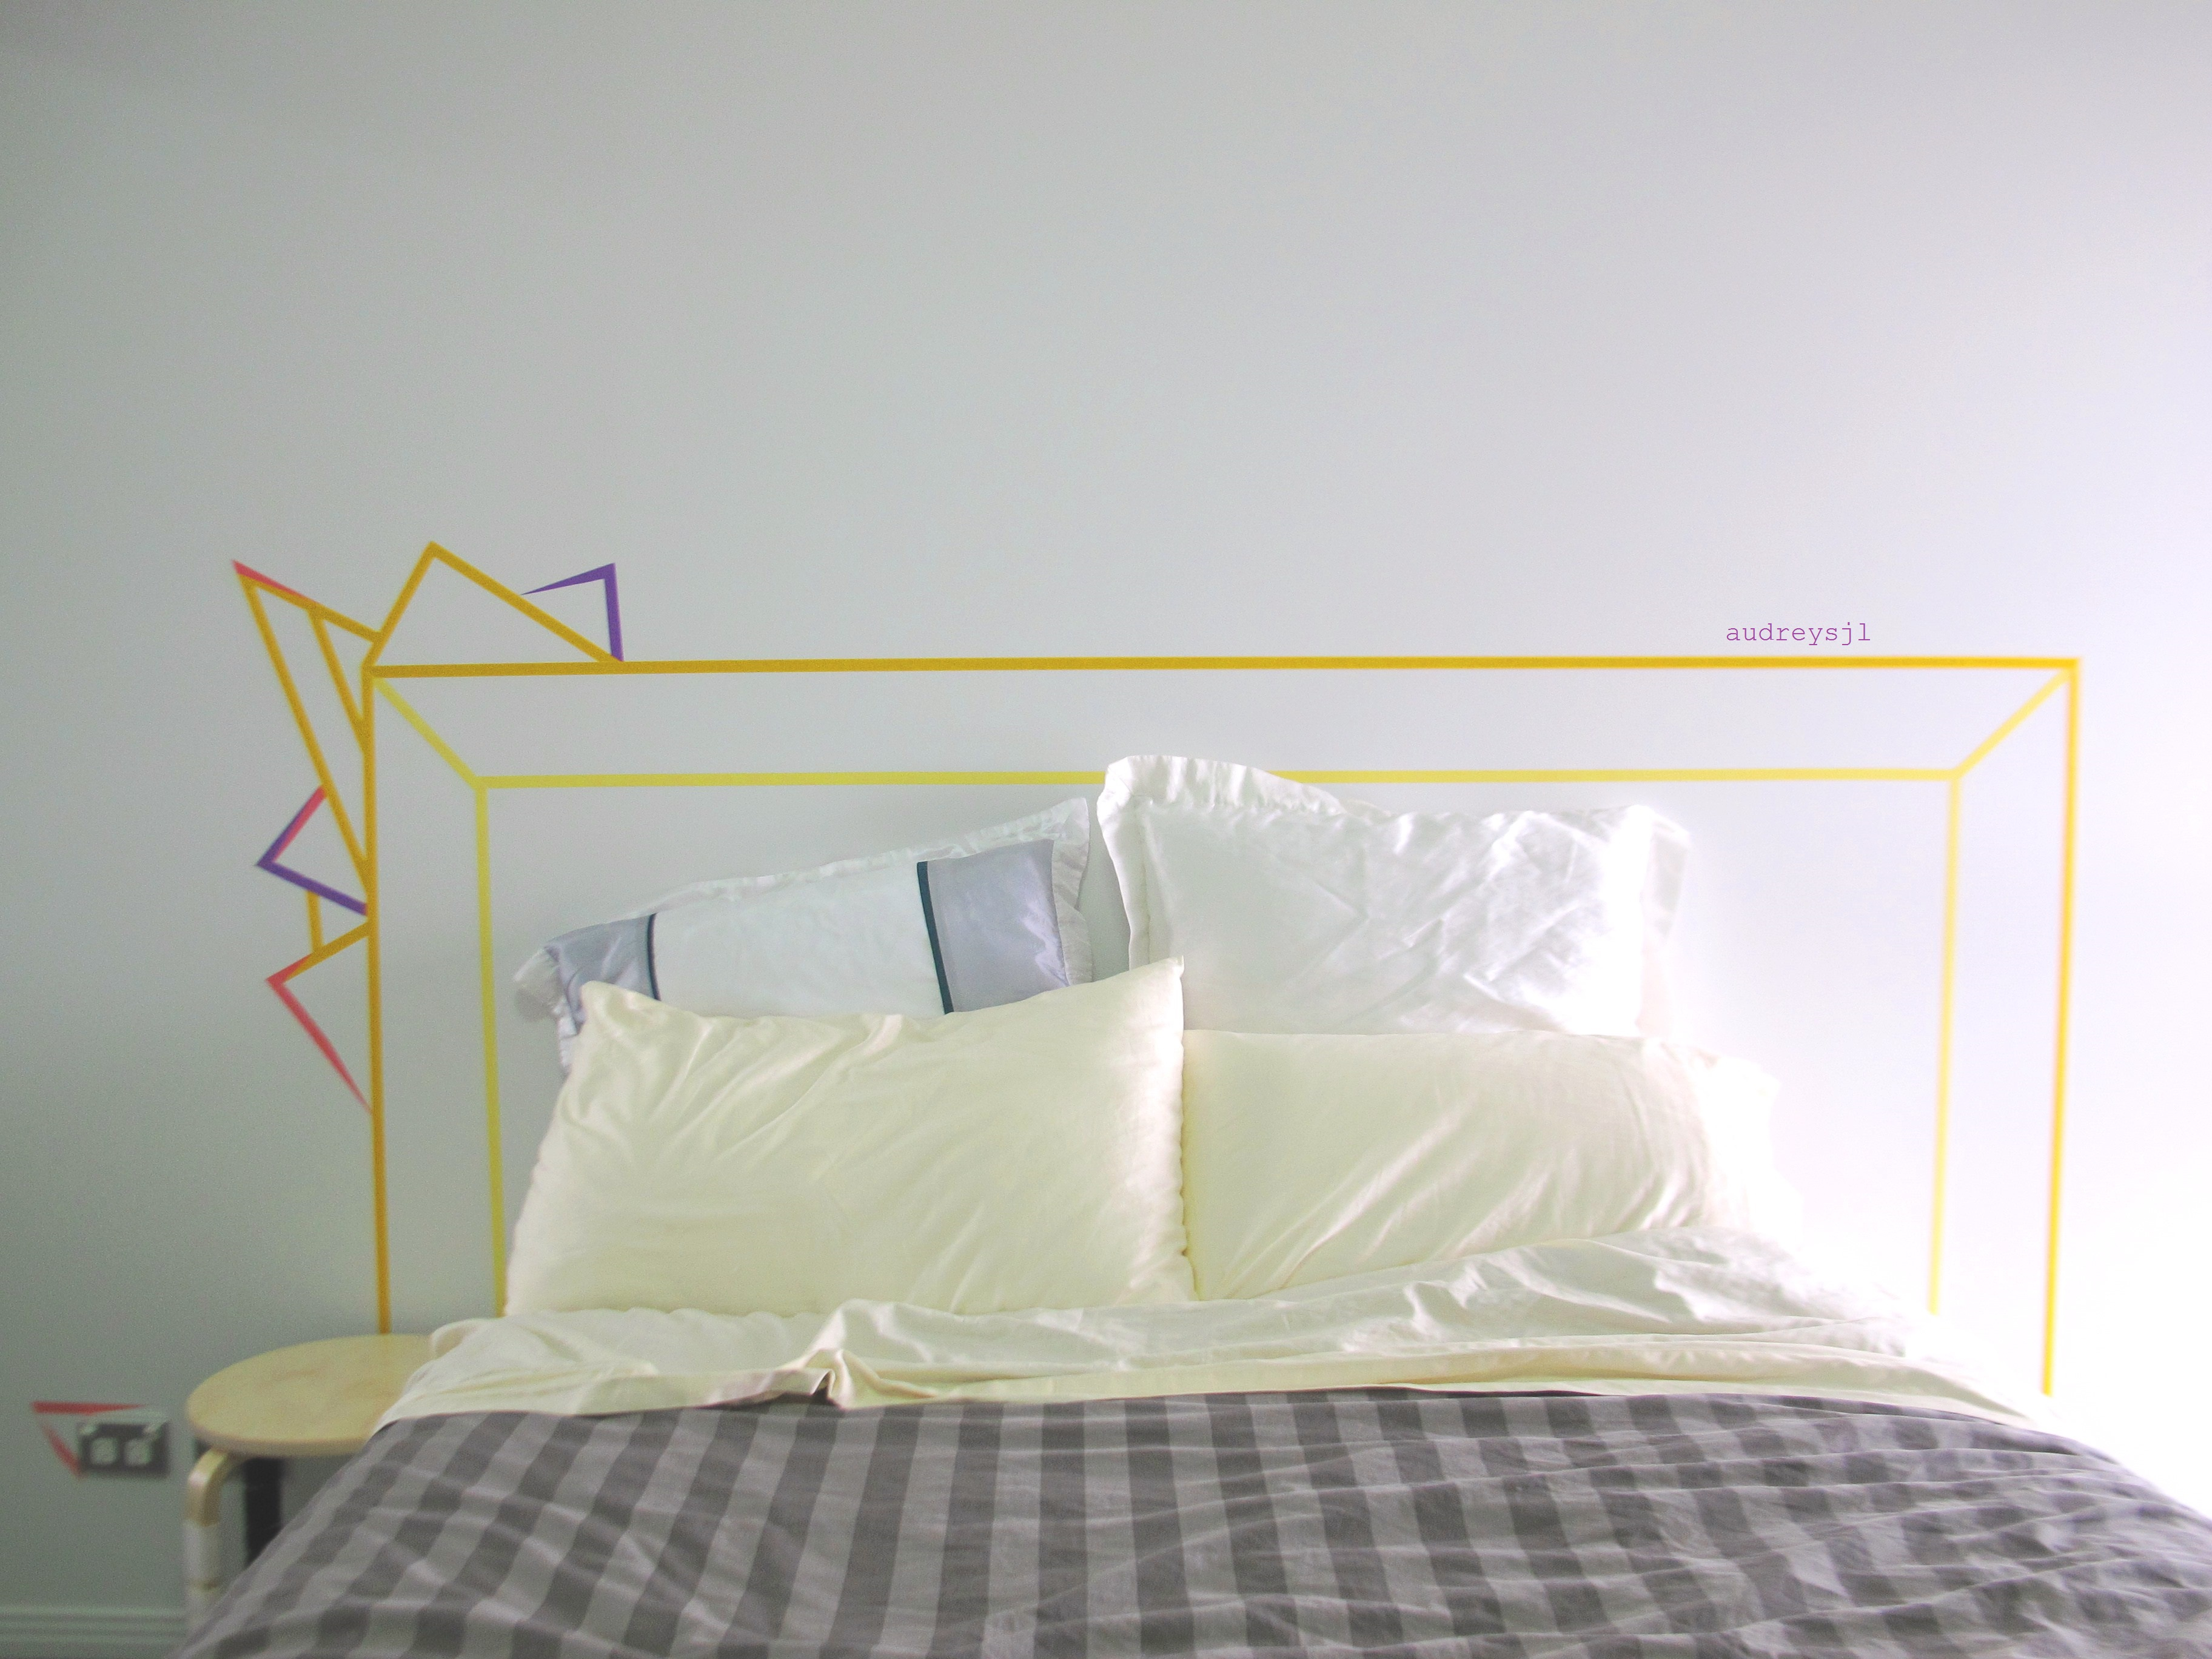 Washi Tape Headboard By Audreysjl